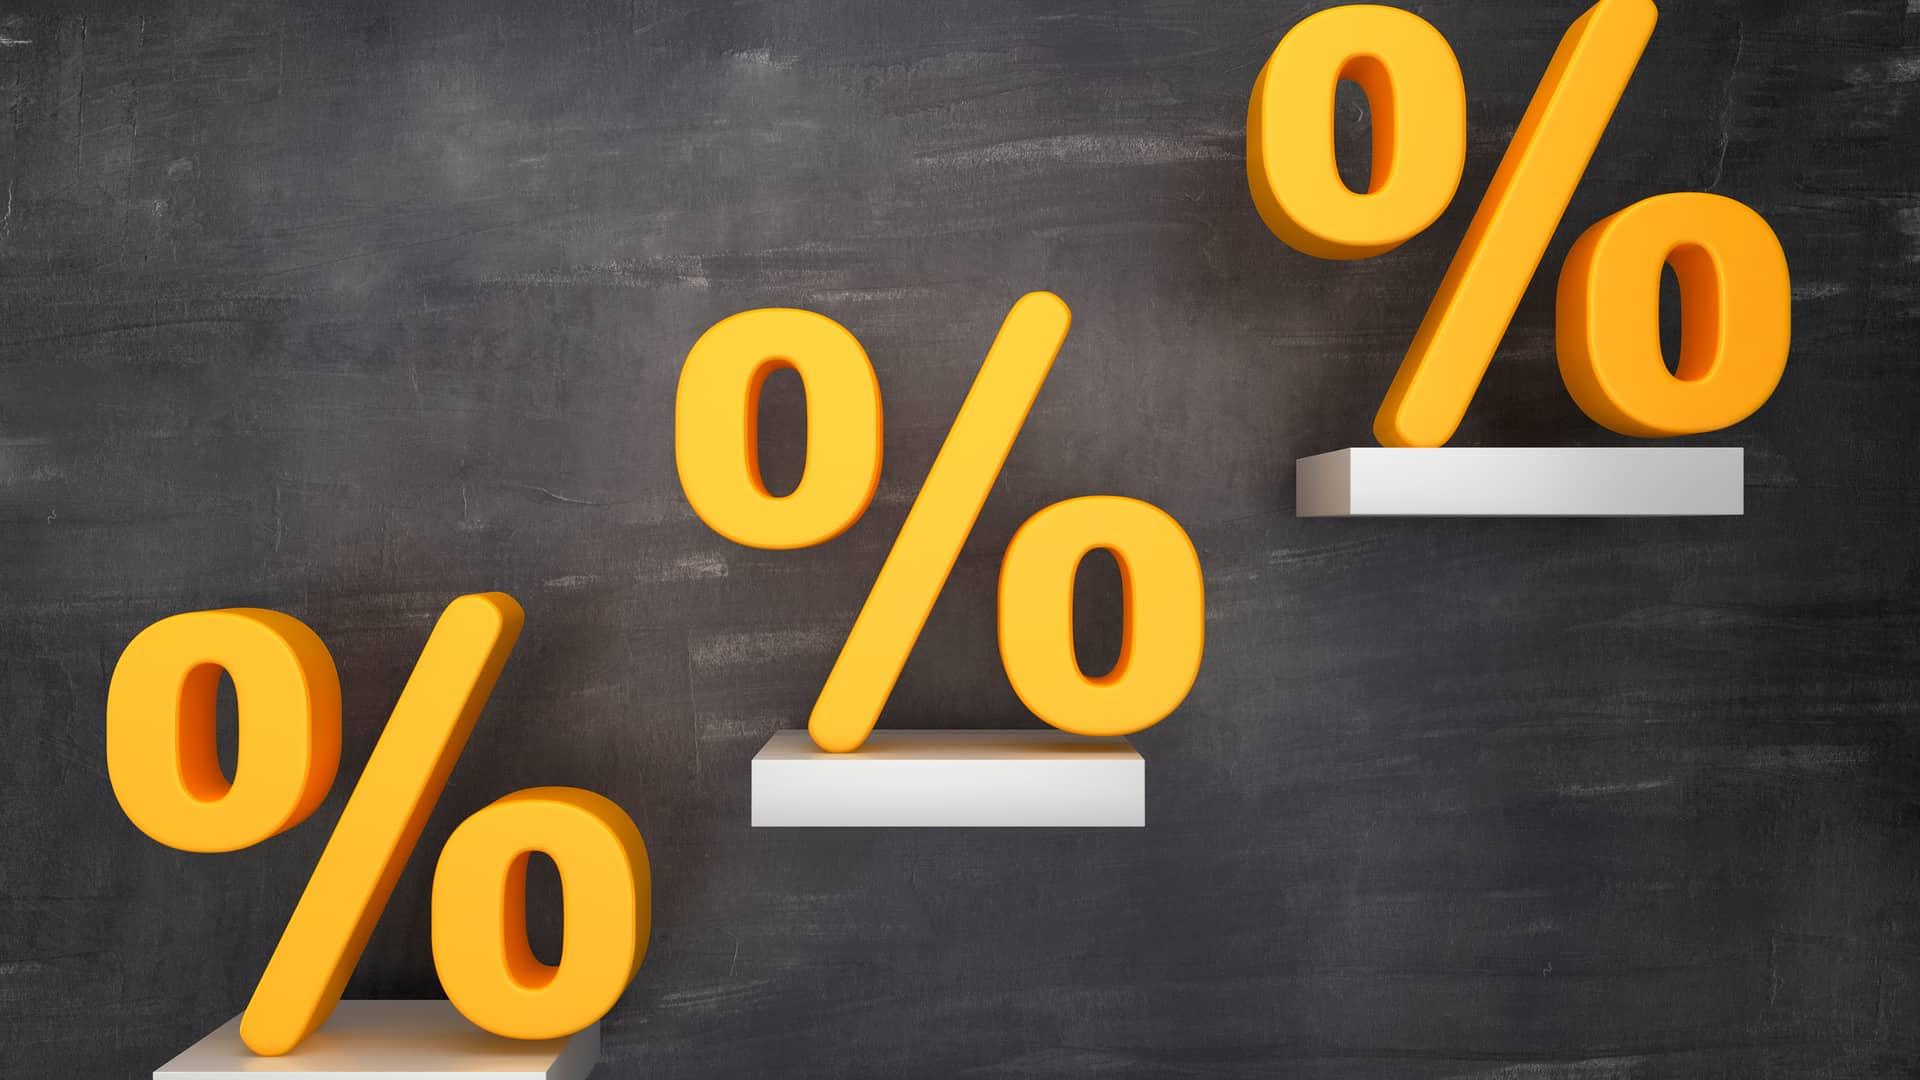 Escalera de porcentajes representa ofertas llamaya